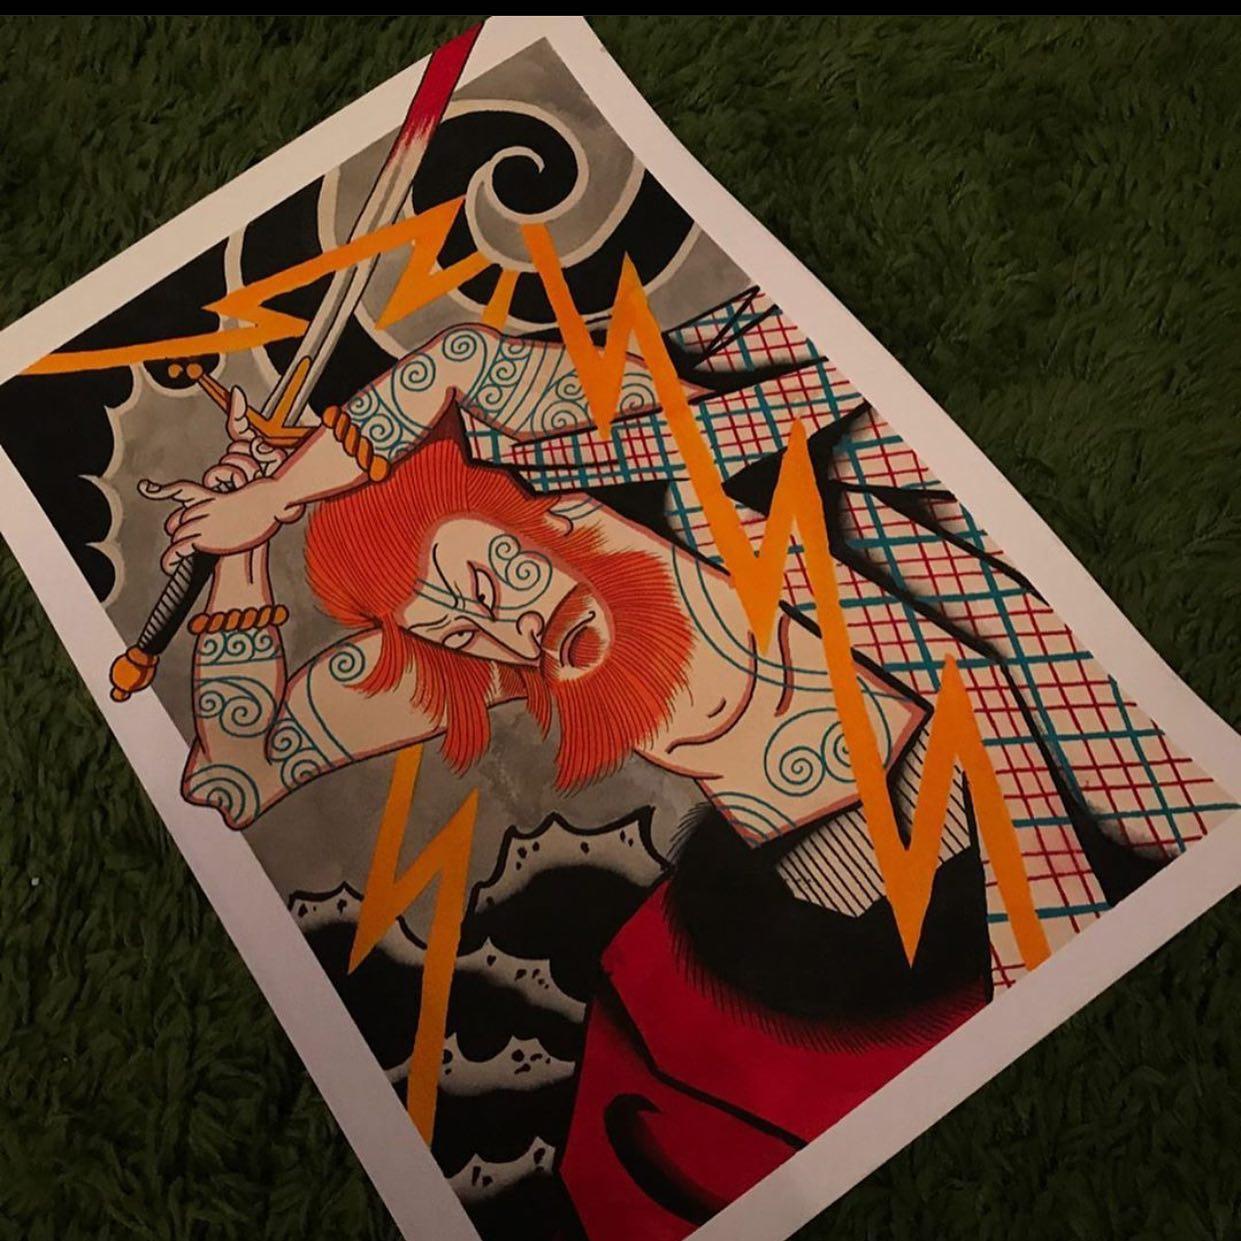 Ever considered mixing both Japanese tattooing and Scottish? @rvltattoo has your back. ————— ————— uktattooartists uktattoo inked inkedmag skinart skinartmag traditionaltattoo tradworkers colourtattoos scotland edinburghtattoo edinburghlife scotlandtattoo uktta oldschooltattoo fineline cleanwork inkdup inkd skindeep performer besttattoos blackclaw girlswithtattoos uktattoosupplies blackclaw solidink sailorjerry scottishtattoo thescottishtattoo studioxiii @barber_dts @easytattoo_uk @eternalink @dynamiccolor @lockdownneedle @stencilstuff